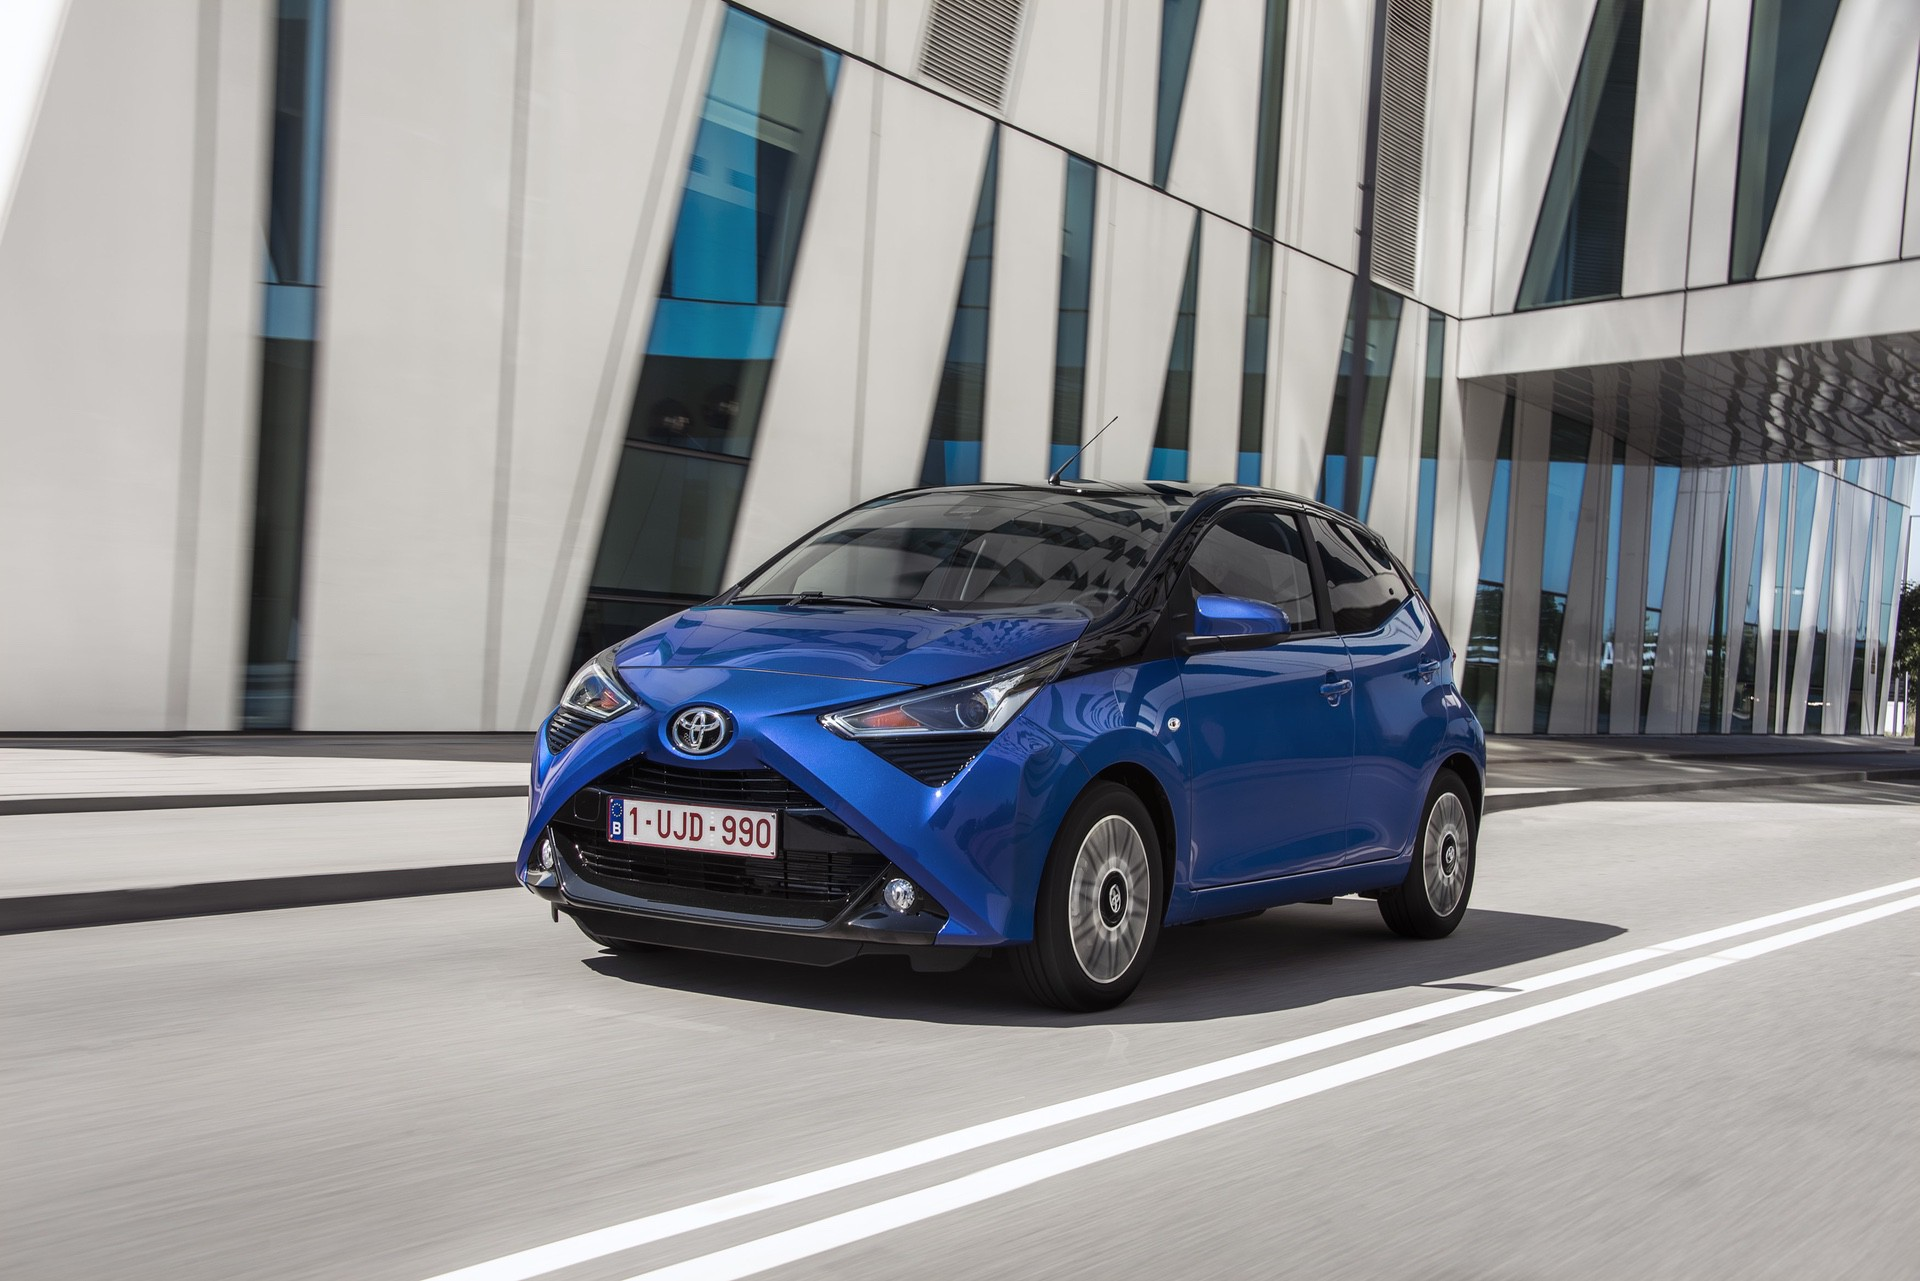 Toyota_Aygo_facelift_presskit_0022